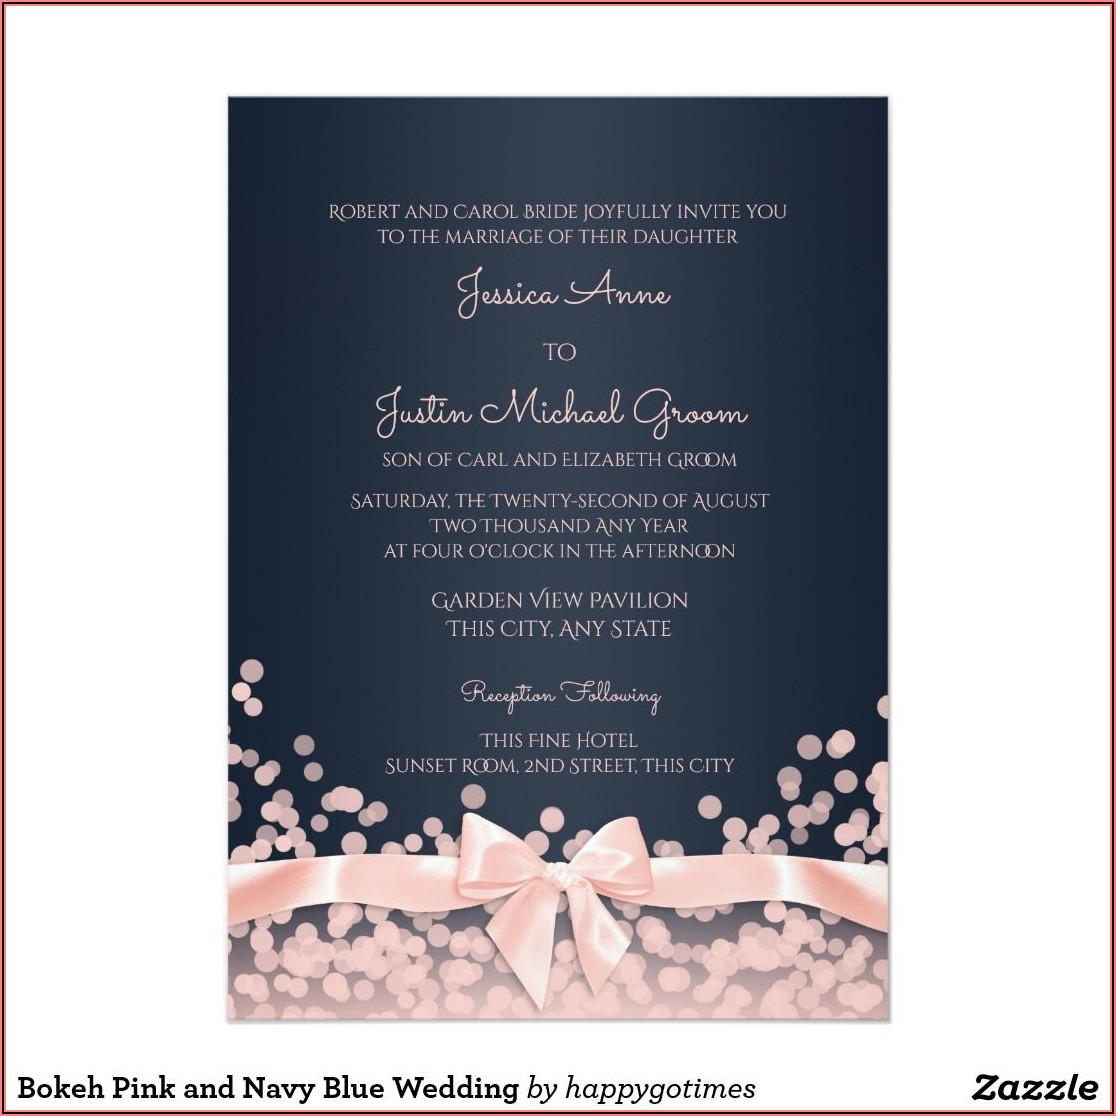 Bokeh Pink And Navy Blue Wedding Invitation